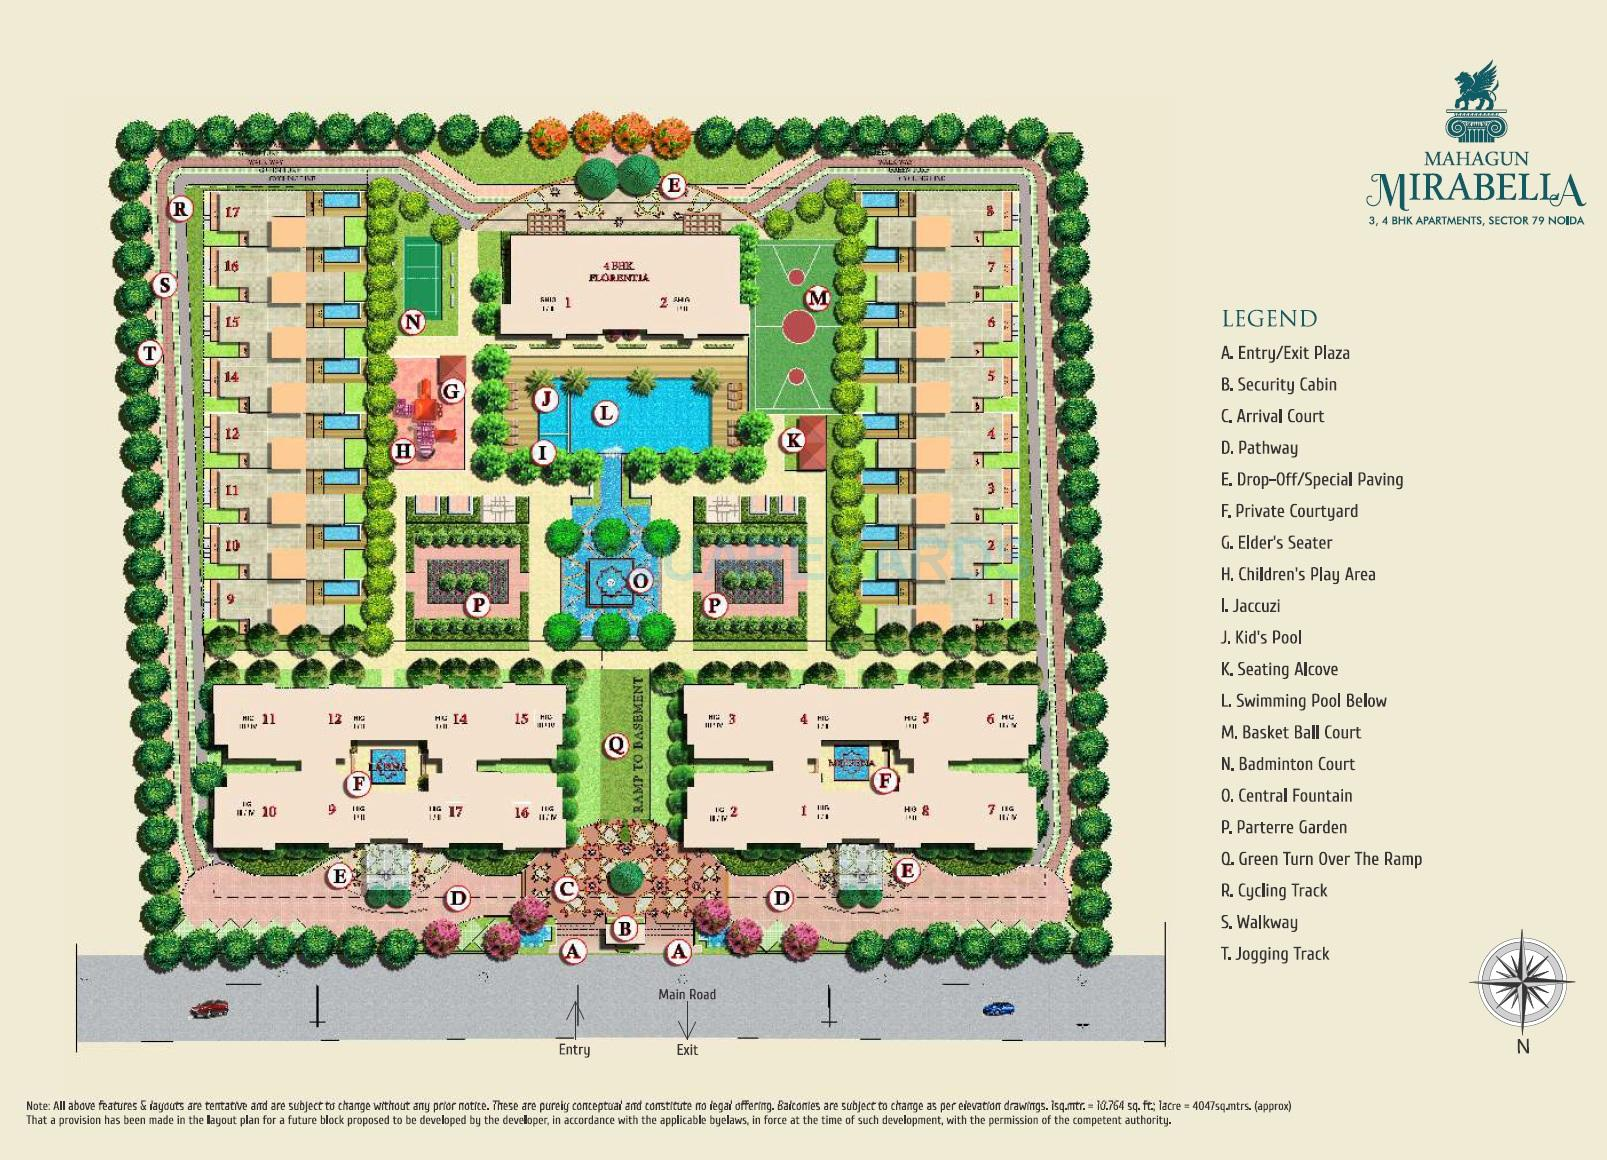 mahagun mirabella master plan image1